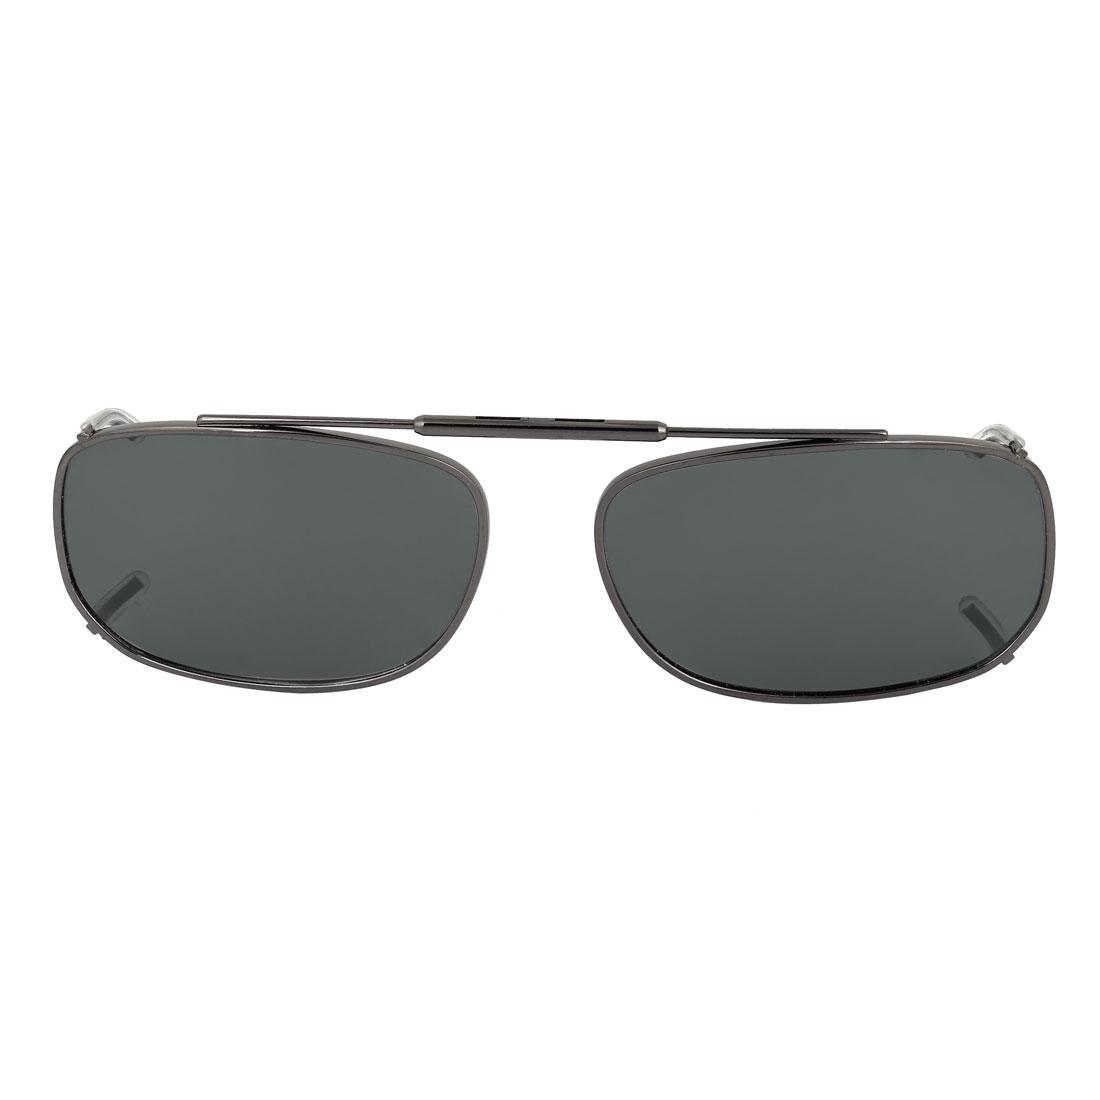 Unisex Outdoor Rimless Dark Gray Polarized Lens Clip on Sunglasses